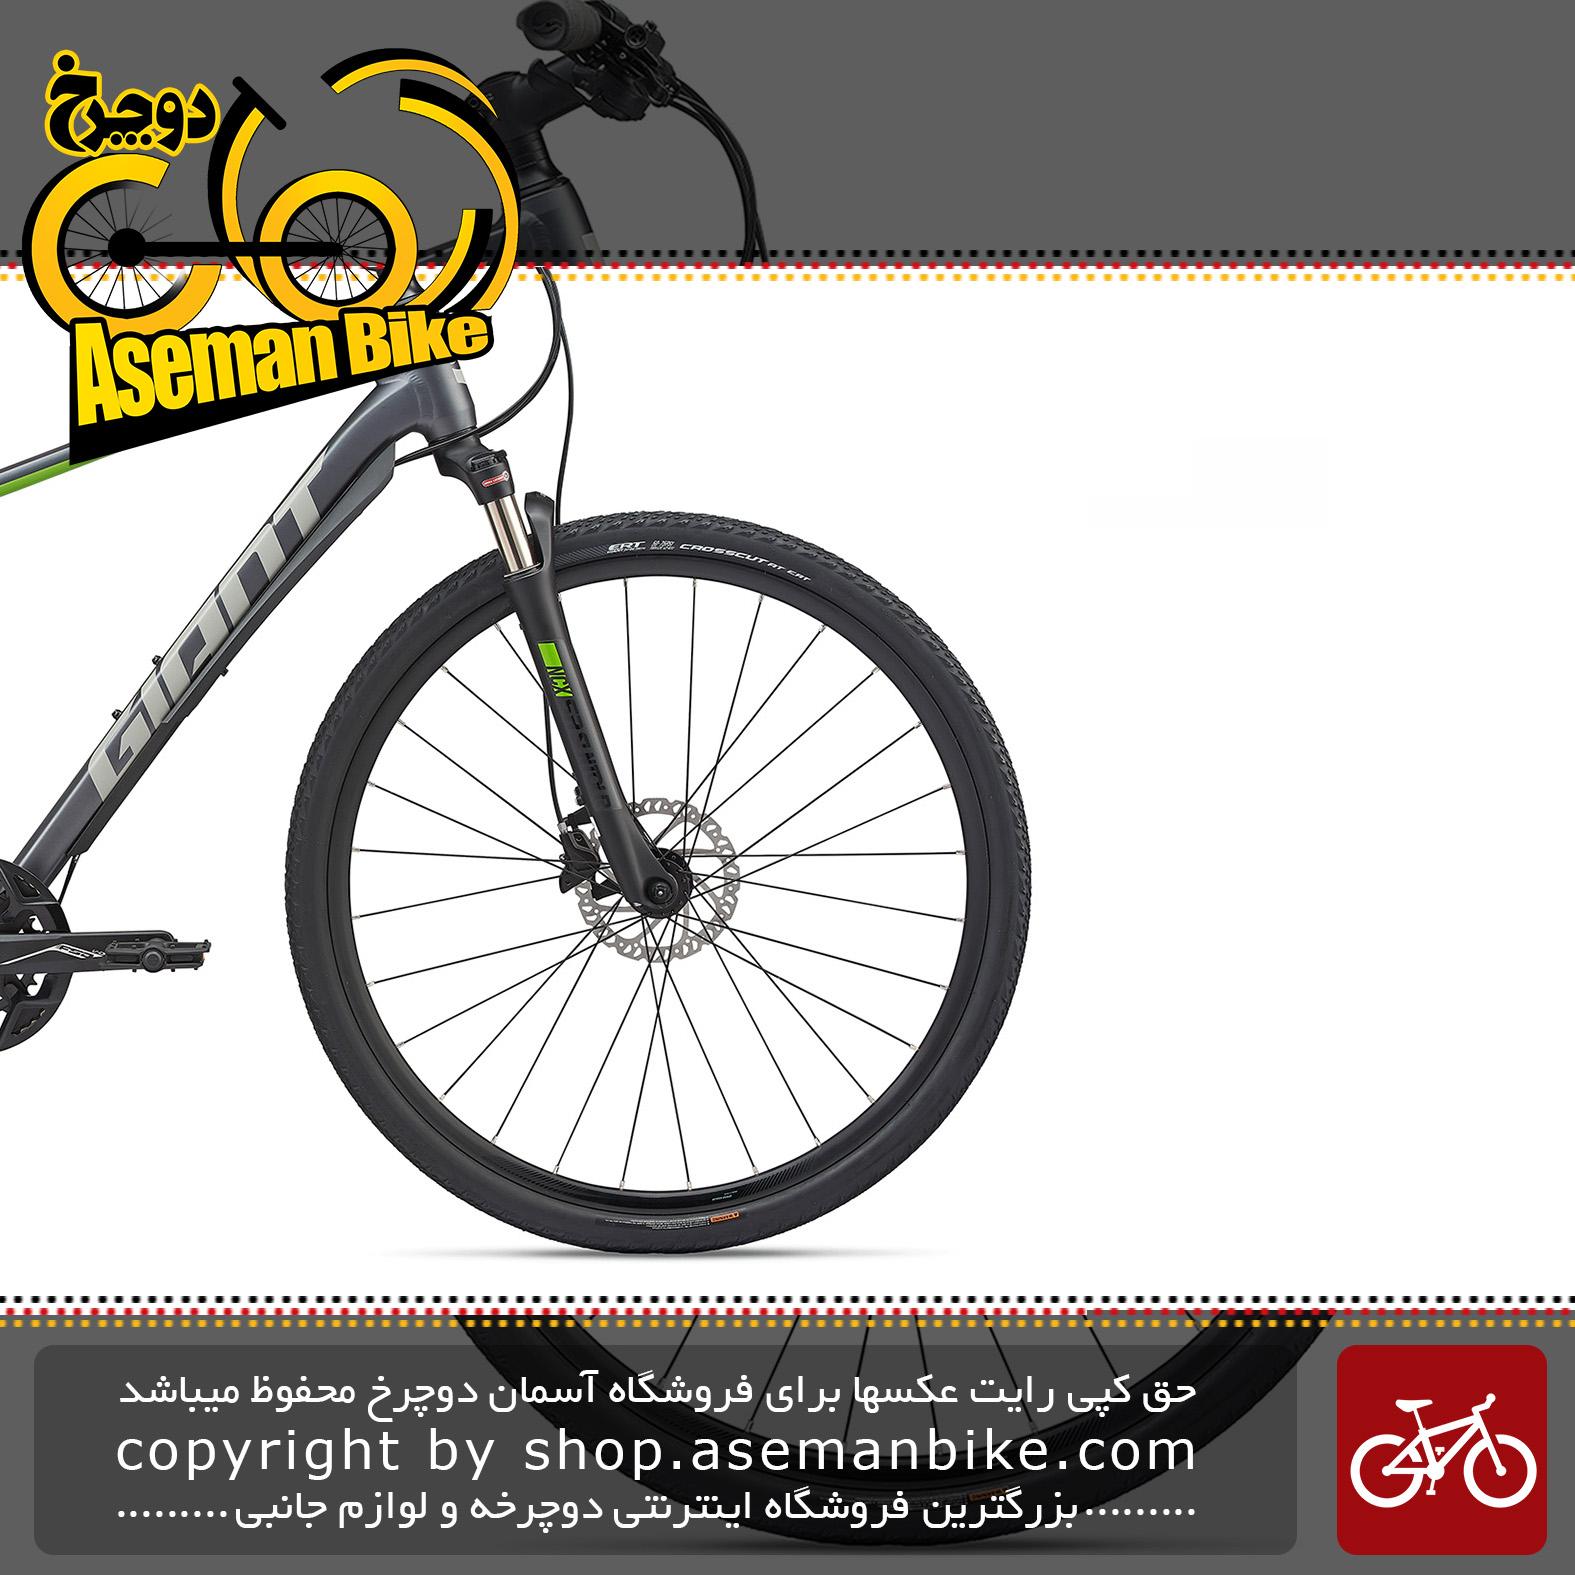 دوچرخه دومنظوره جاینت مدل روآم 1 دیسک هیدرولیک 2020 Giant Adventure Bicycle Roam 1 Disc 2020